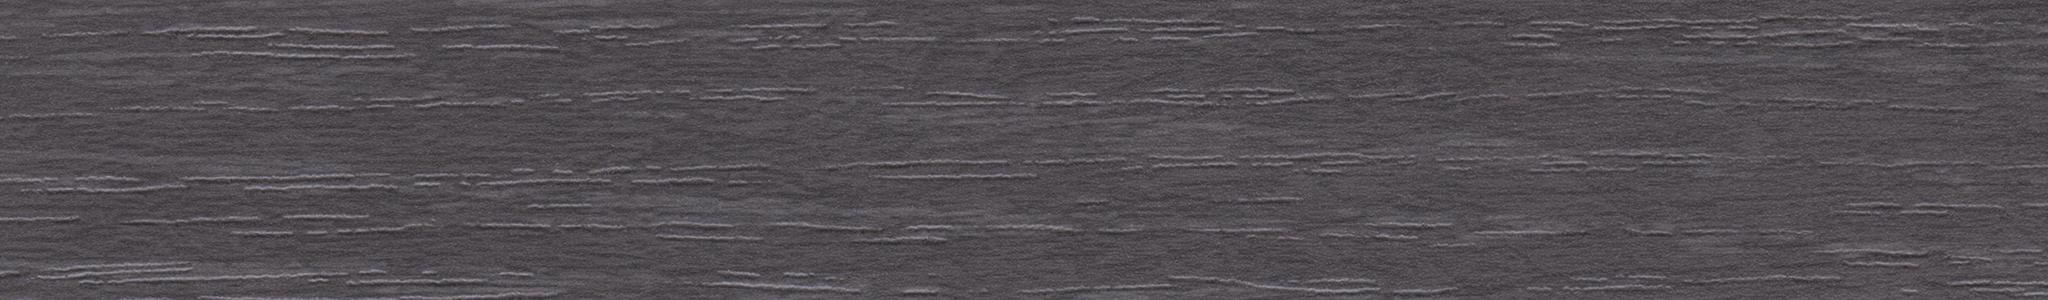 HD 294423 ABS hrana metalwood gravír